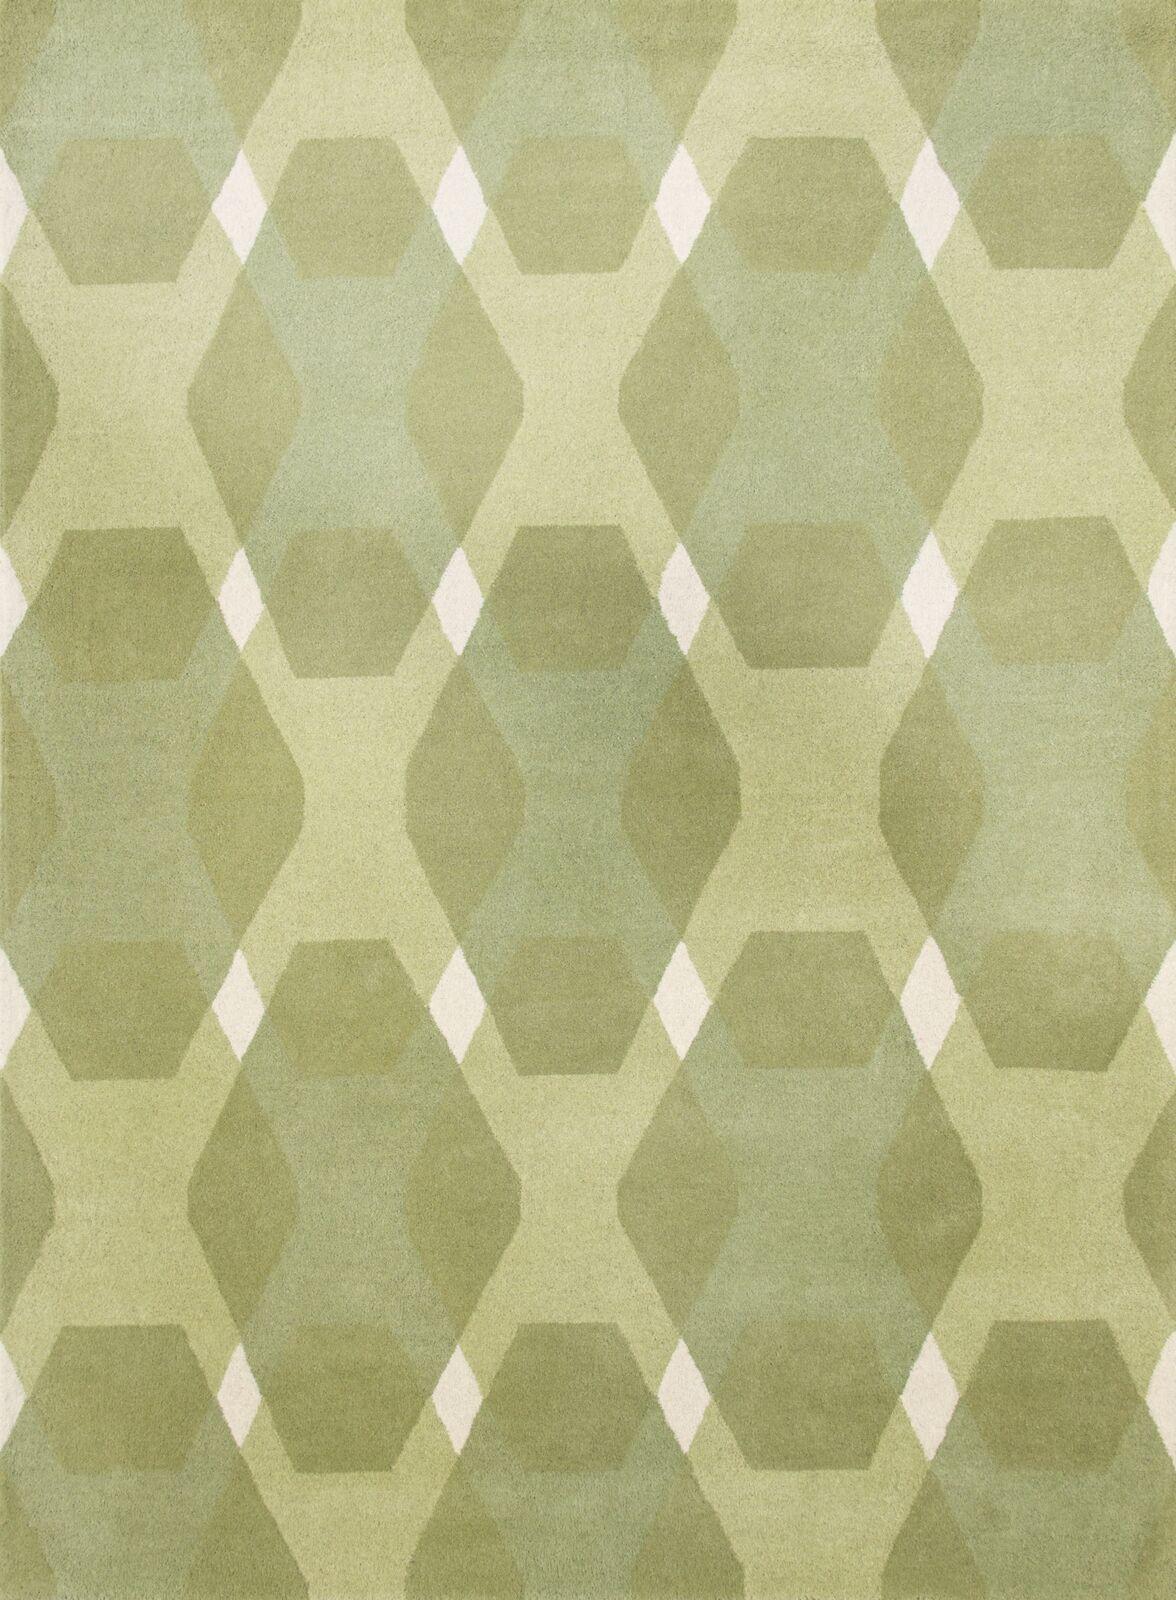 Diamond Hand-Loomed Green/White Area Rug Rug Size: Rectangle 9' x 12'